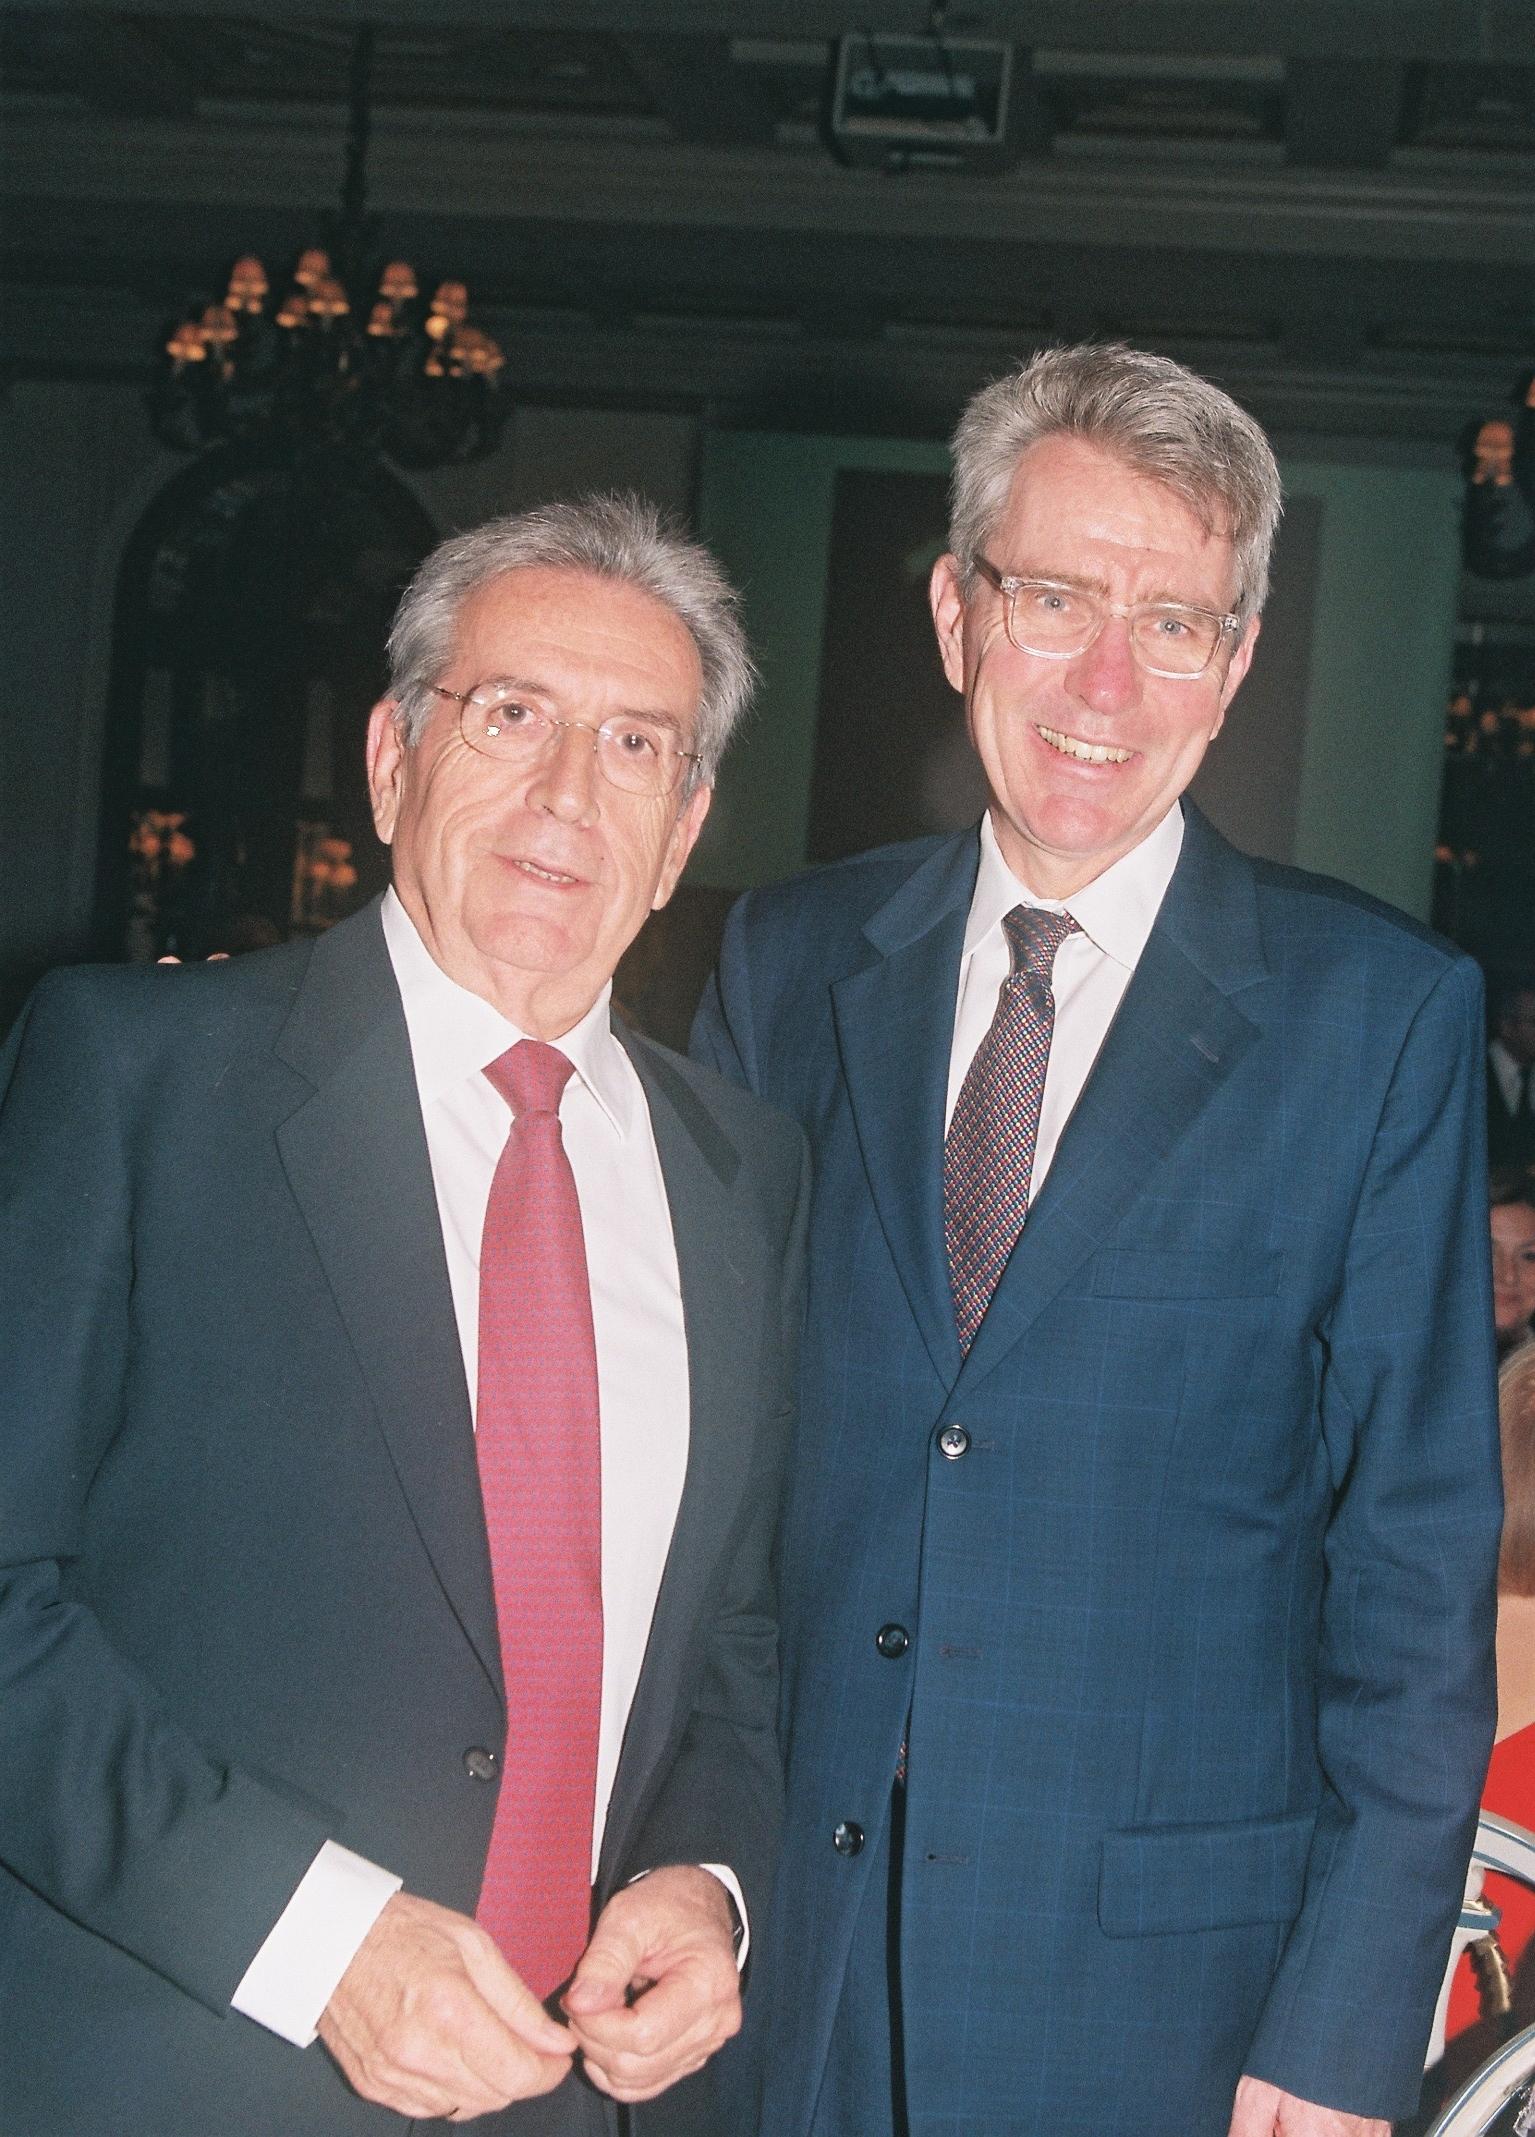 Dr. Behrakis and Ambassador Pyatt.